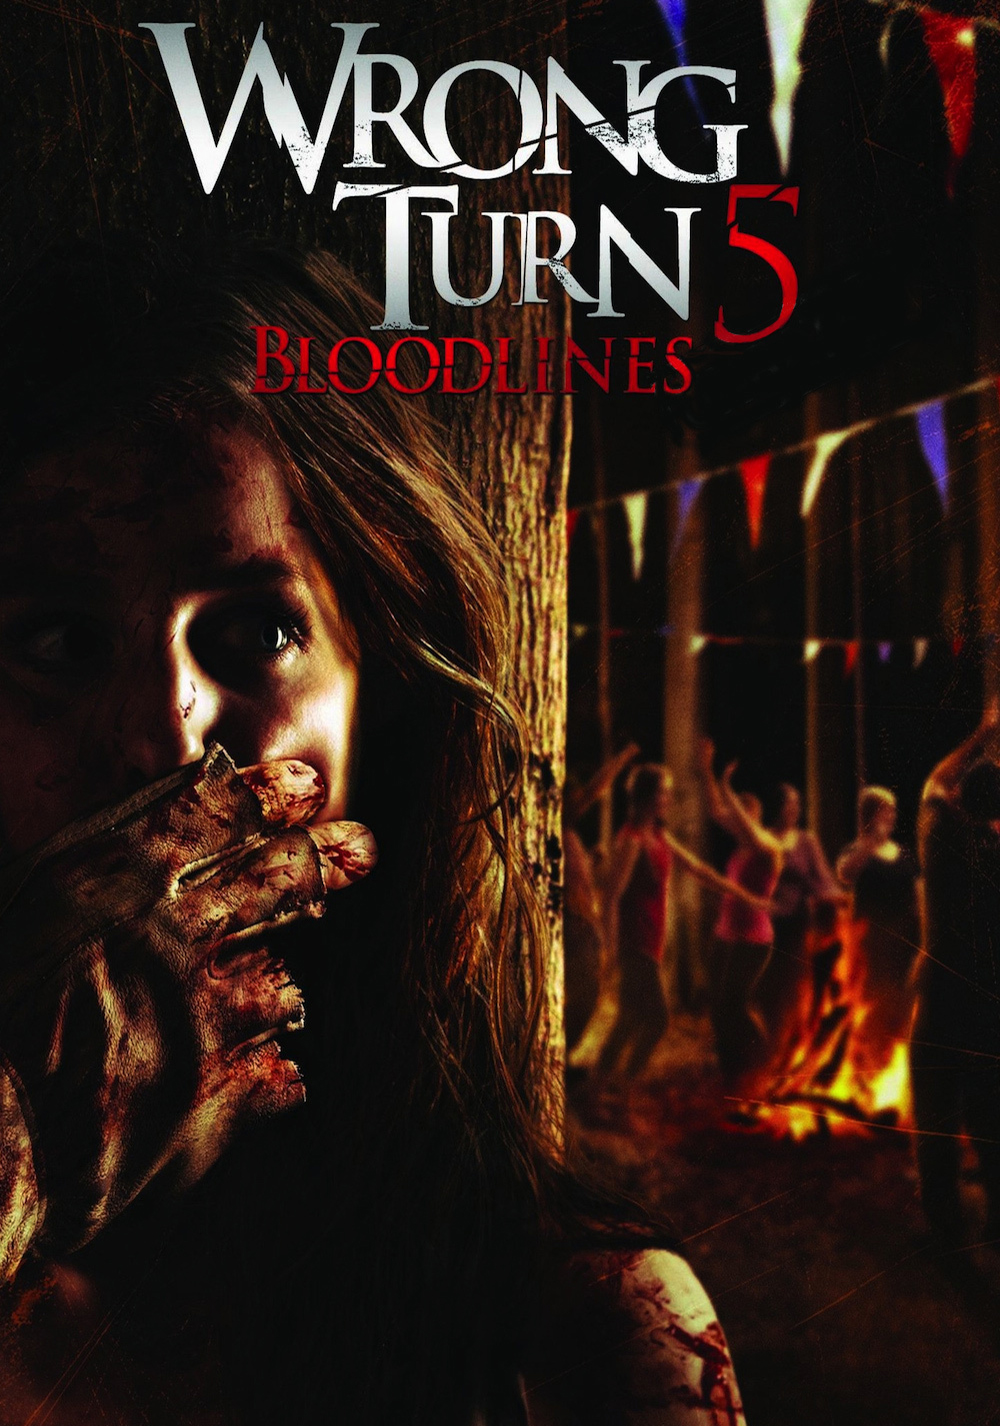 wrong turn 5 full movie